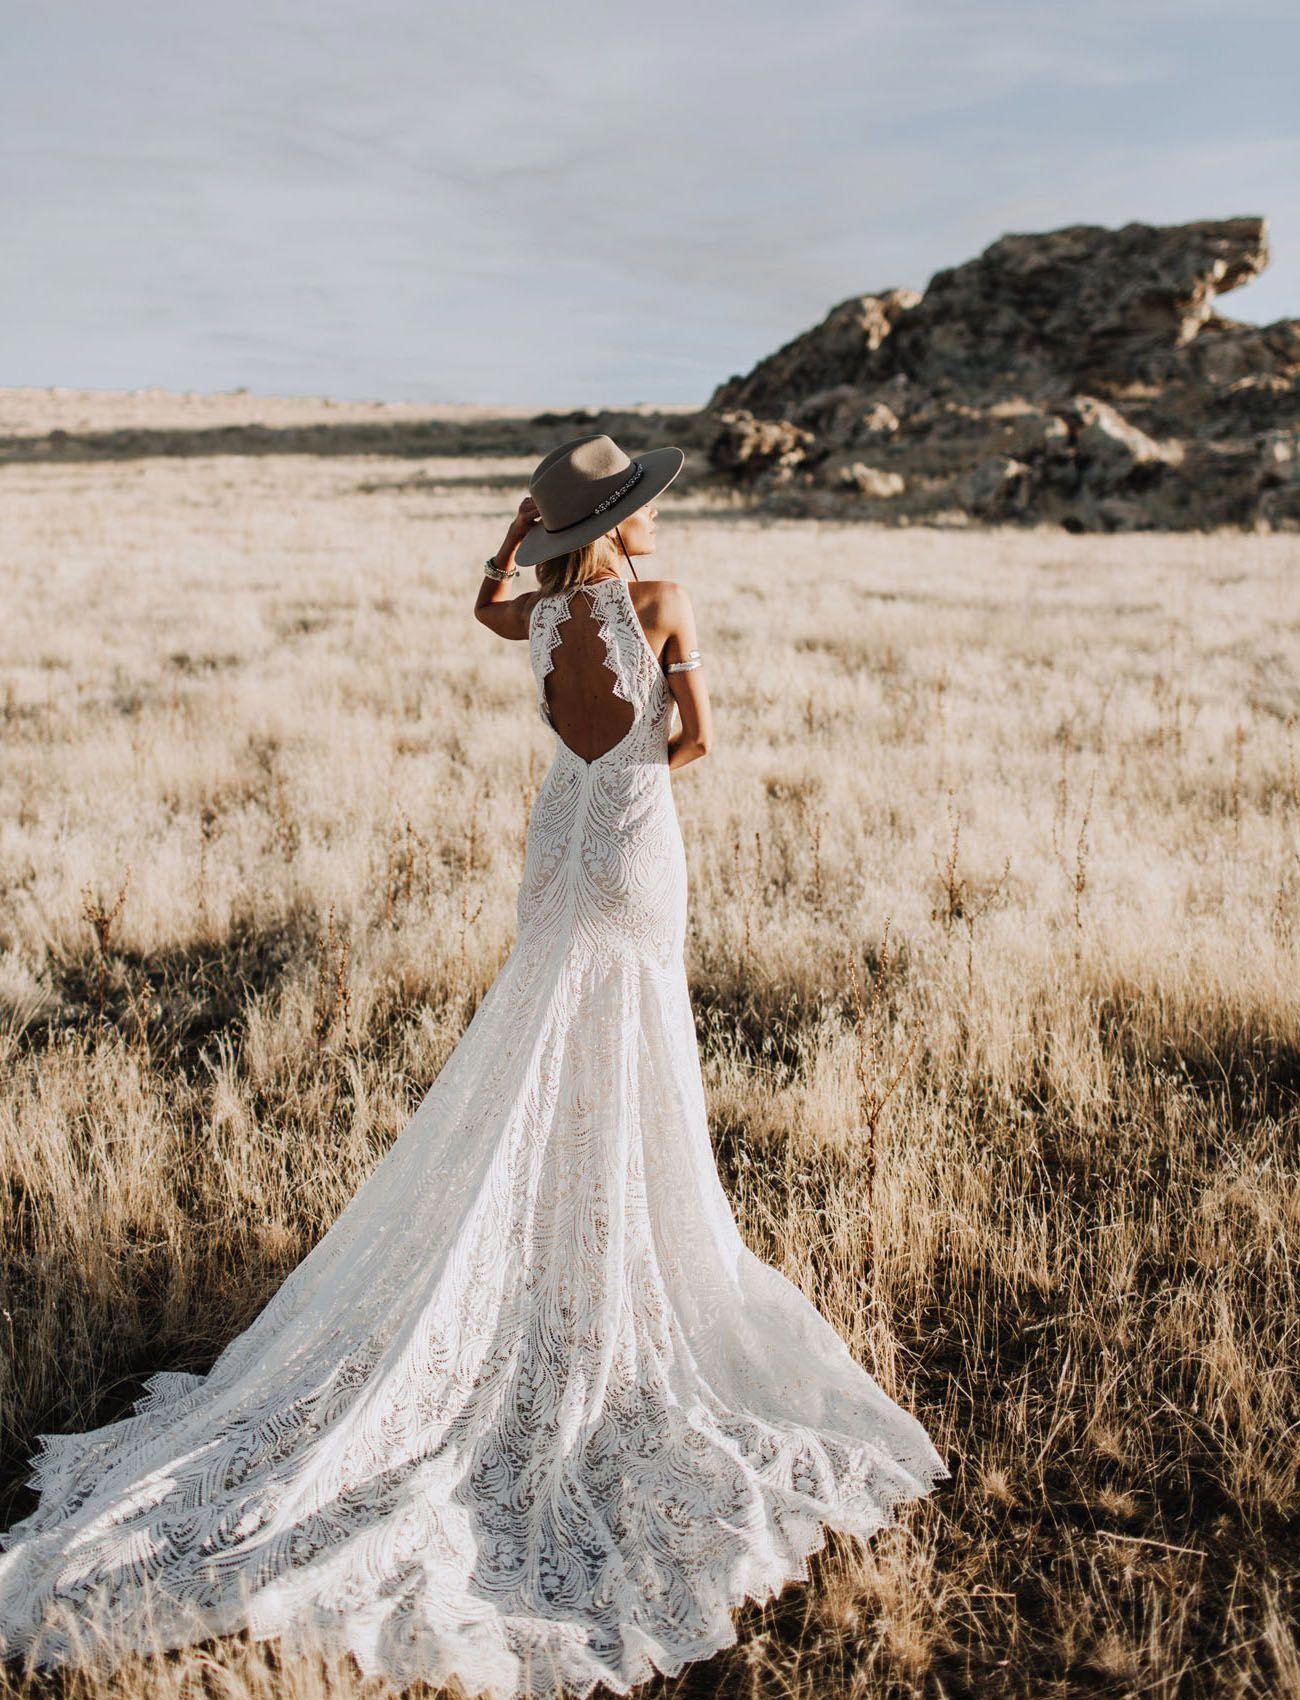 Open Back Wedding Dress Gws Lovers Society Collection Boho Lace Wedding Dress Meg Legs Of Styl Boho Wedding Dress Lace Bridal Dresses Lace Wedding Dresses [ 1700 x 1300 Pixel ]